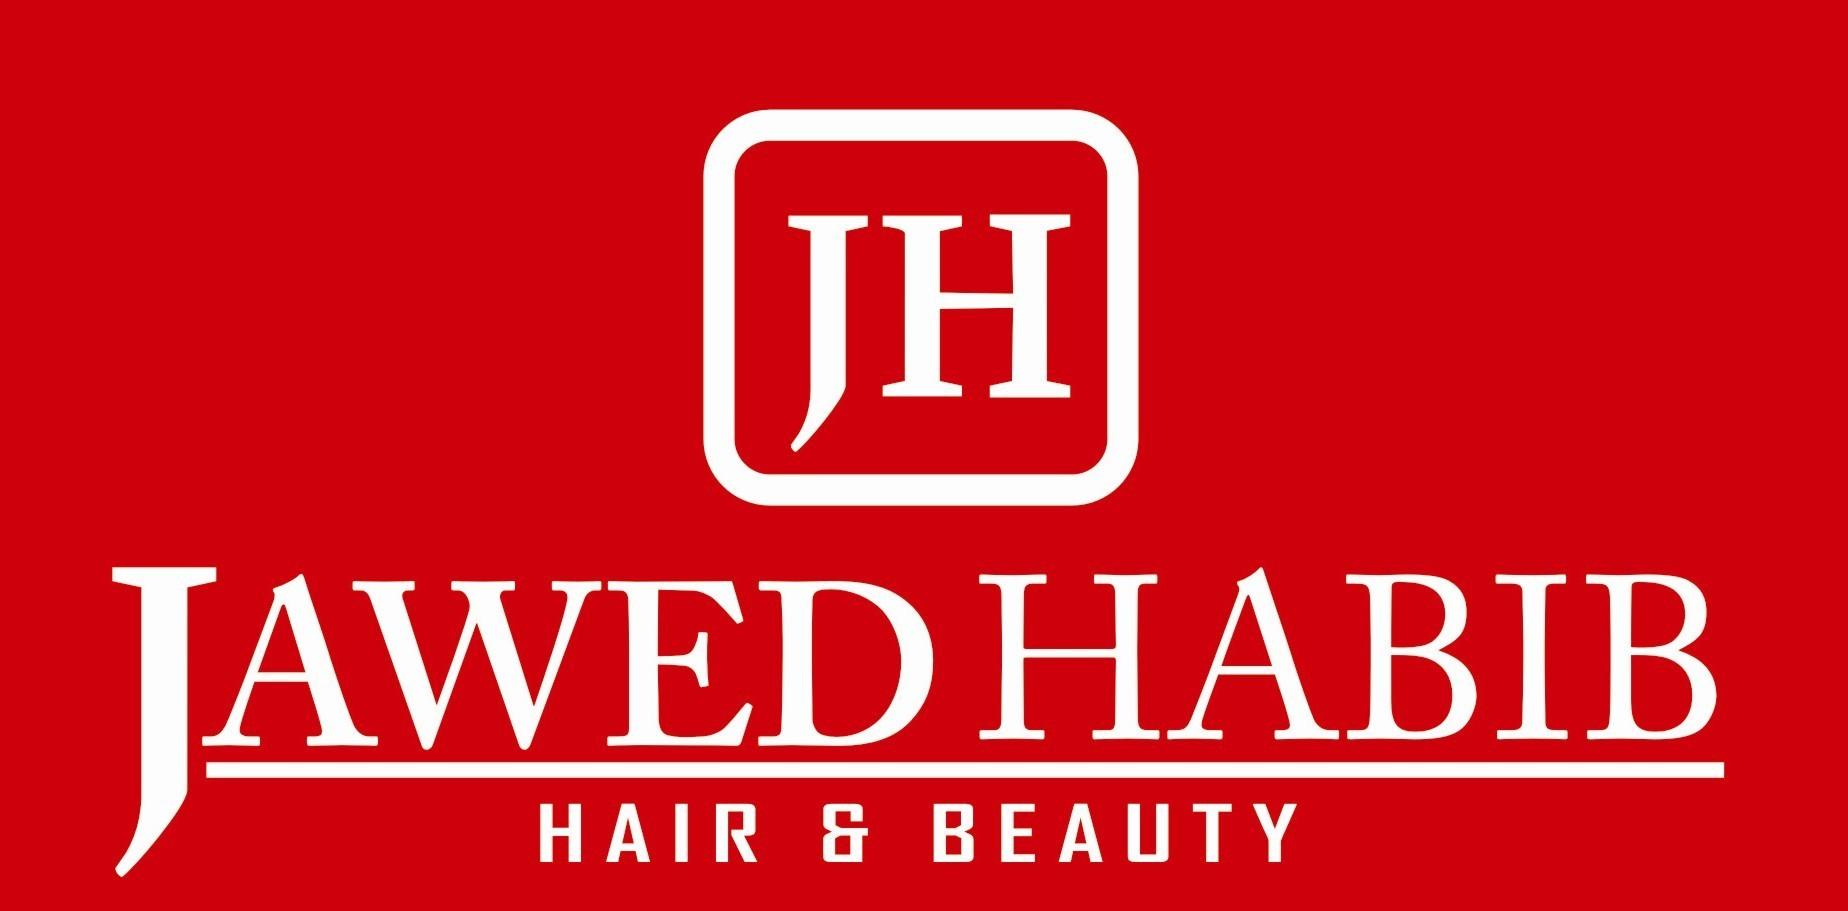 Jawed Habib Hair & Beauty Salons - Bannerghatta Road - Bangalore Image